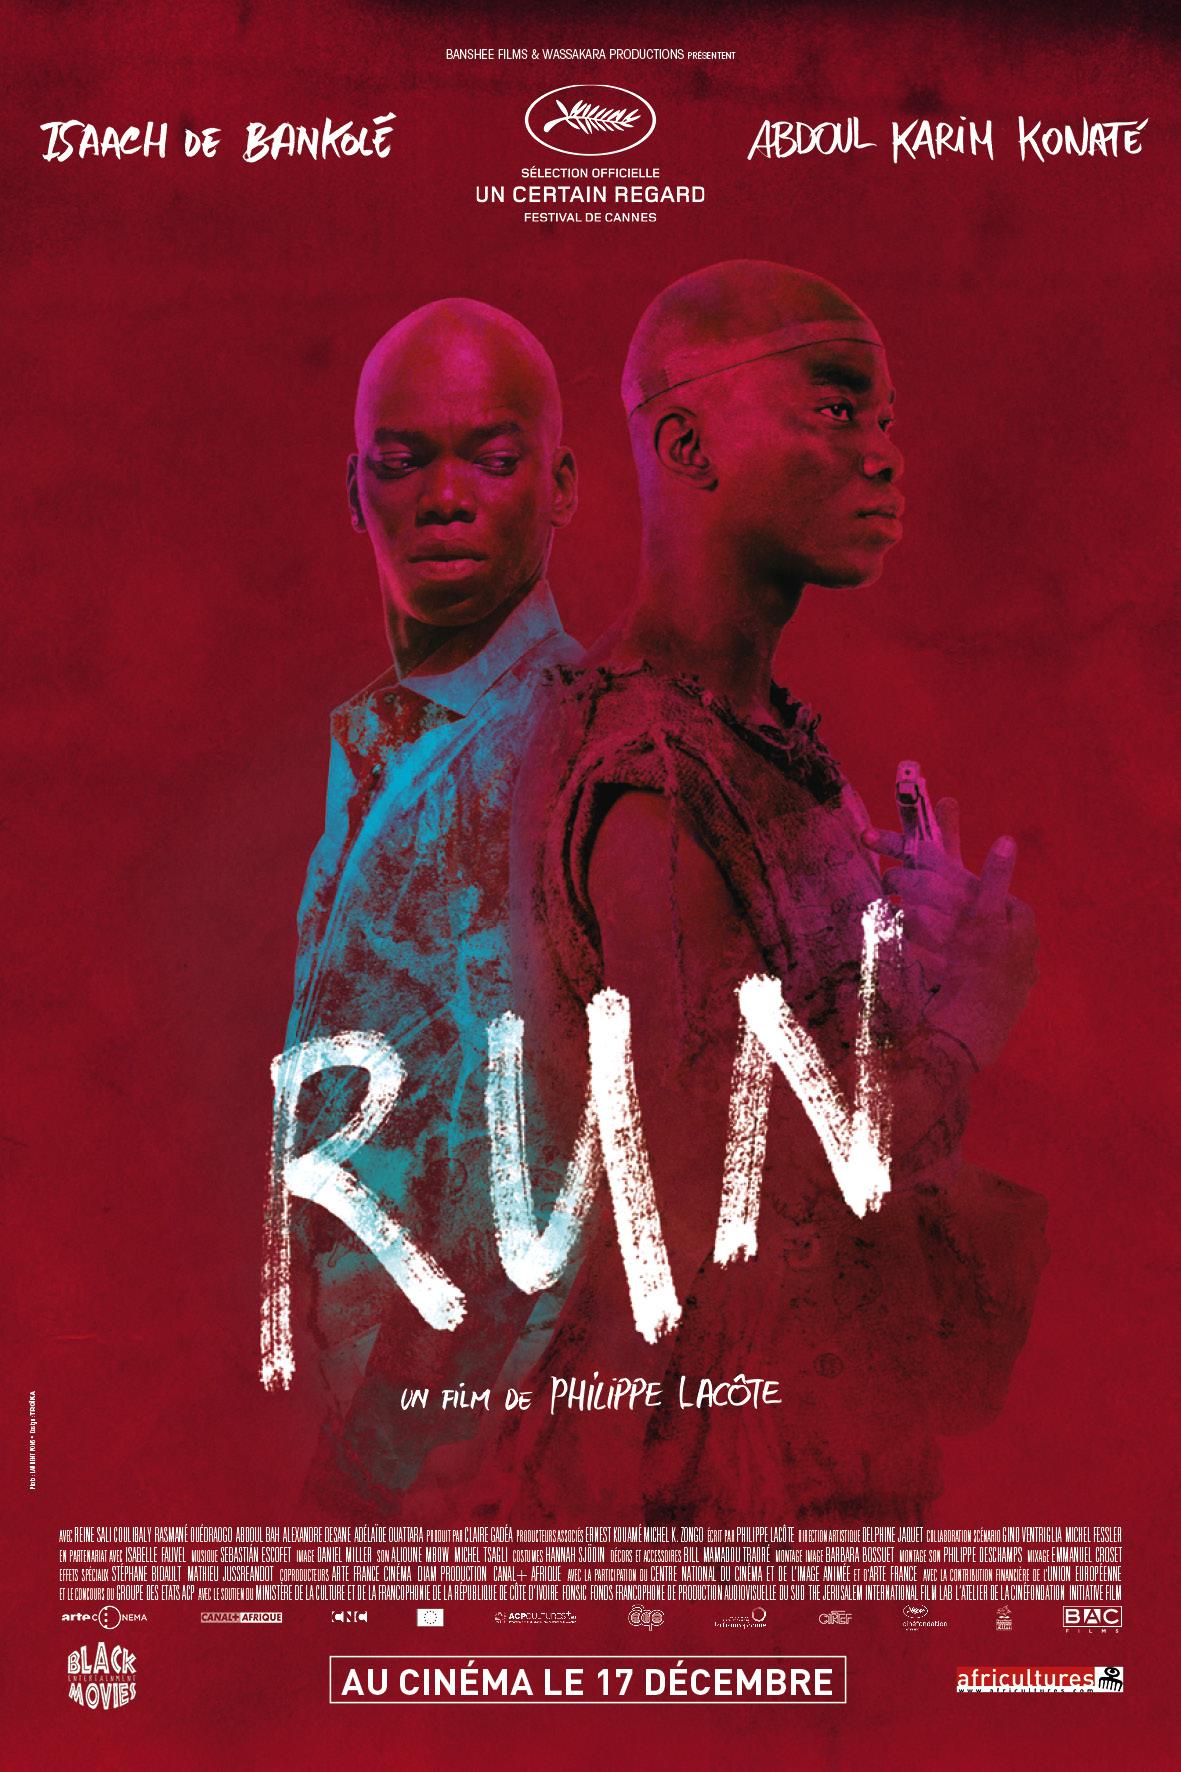 Filme Africano with regard to run | cinemaemovimentoblog